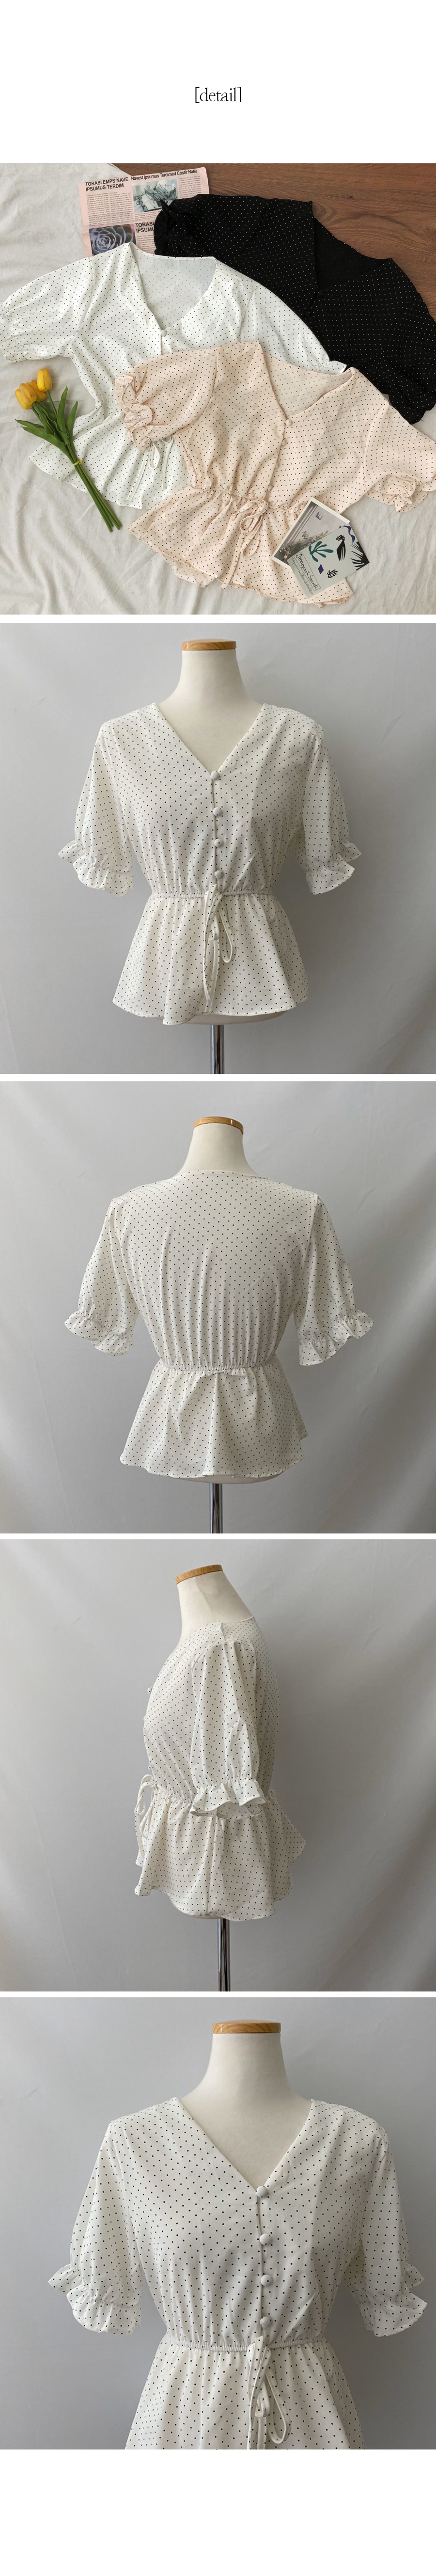 Ria dot flare short sleeve blouse